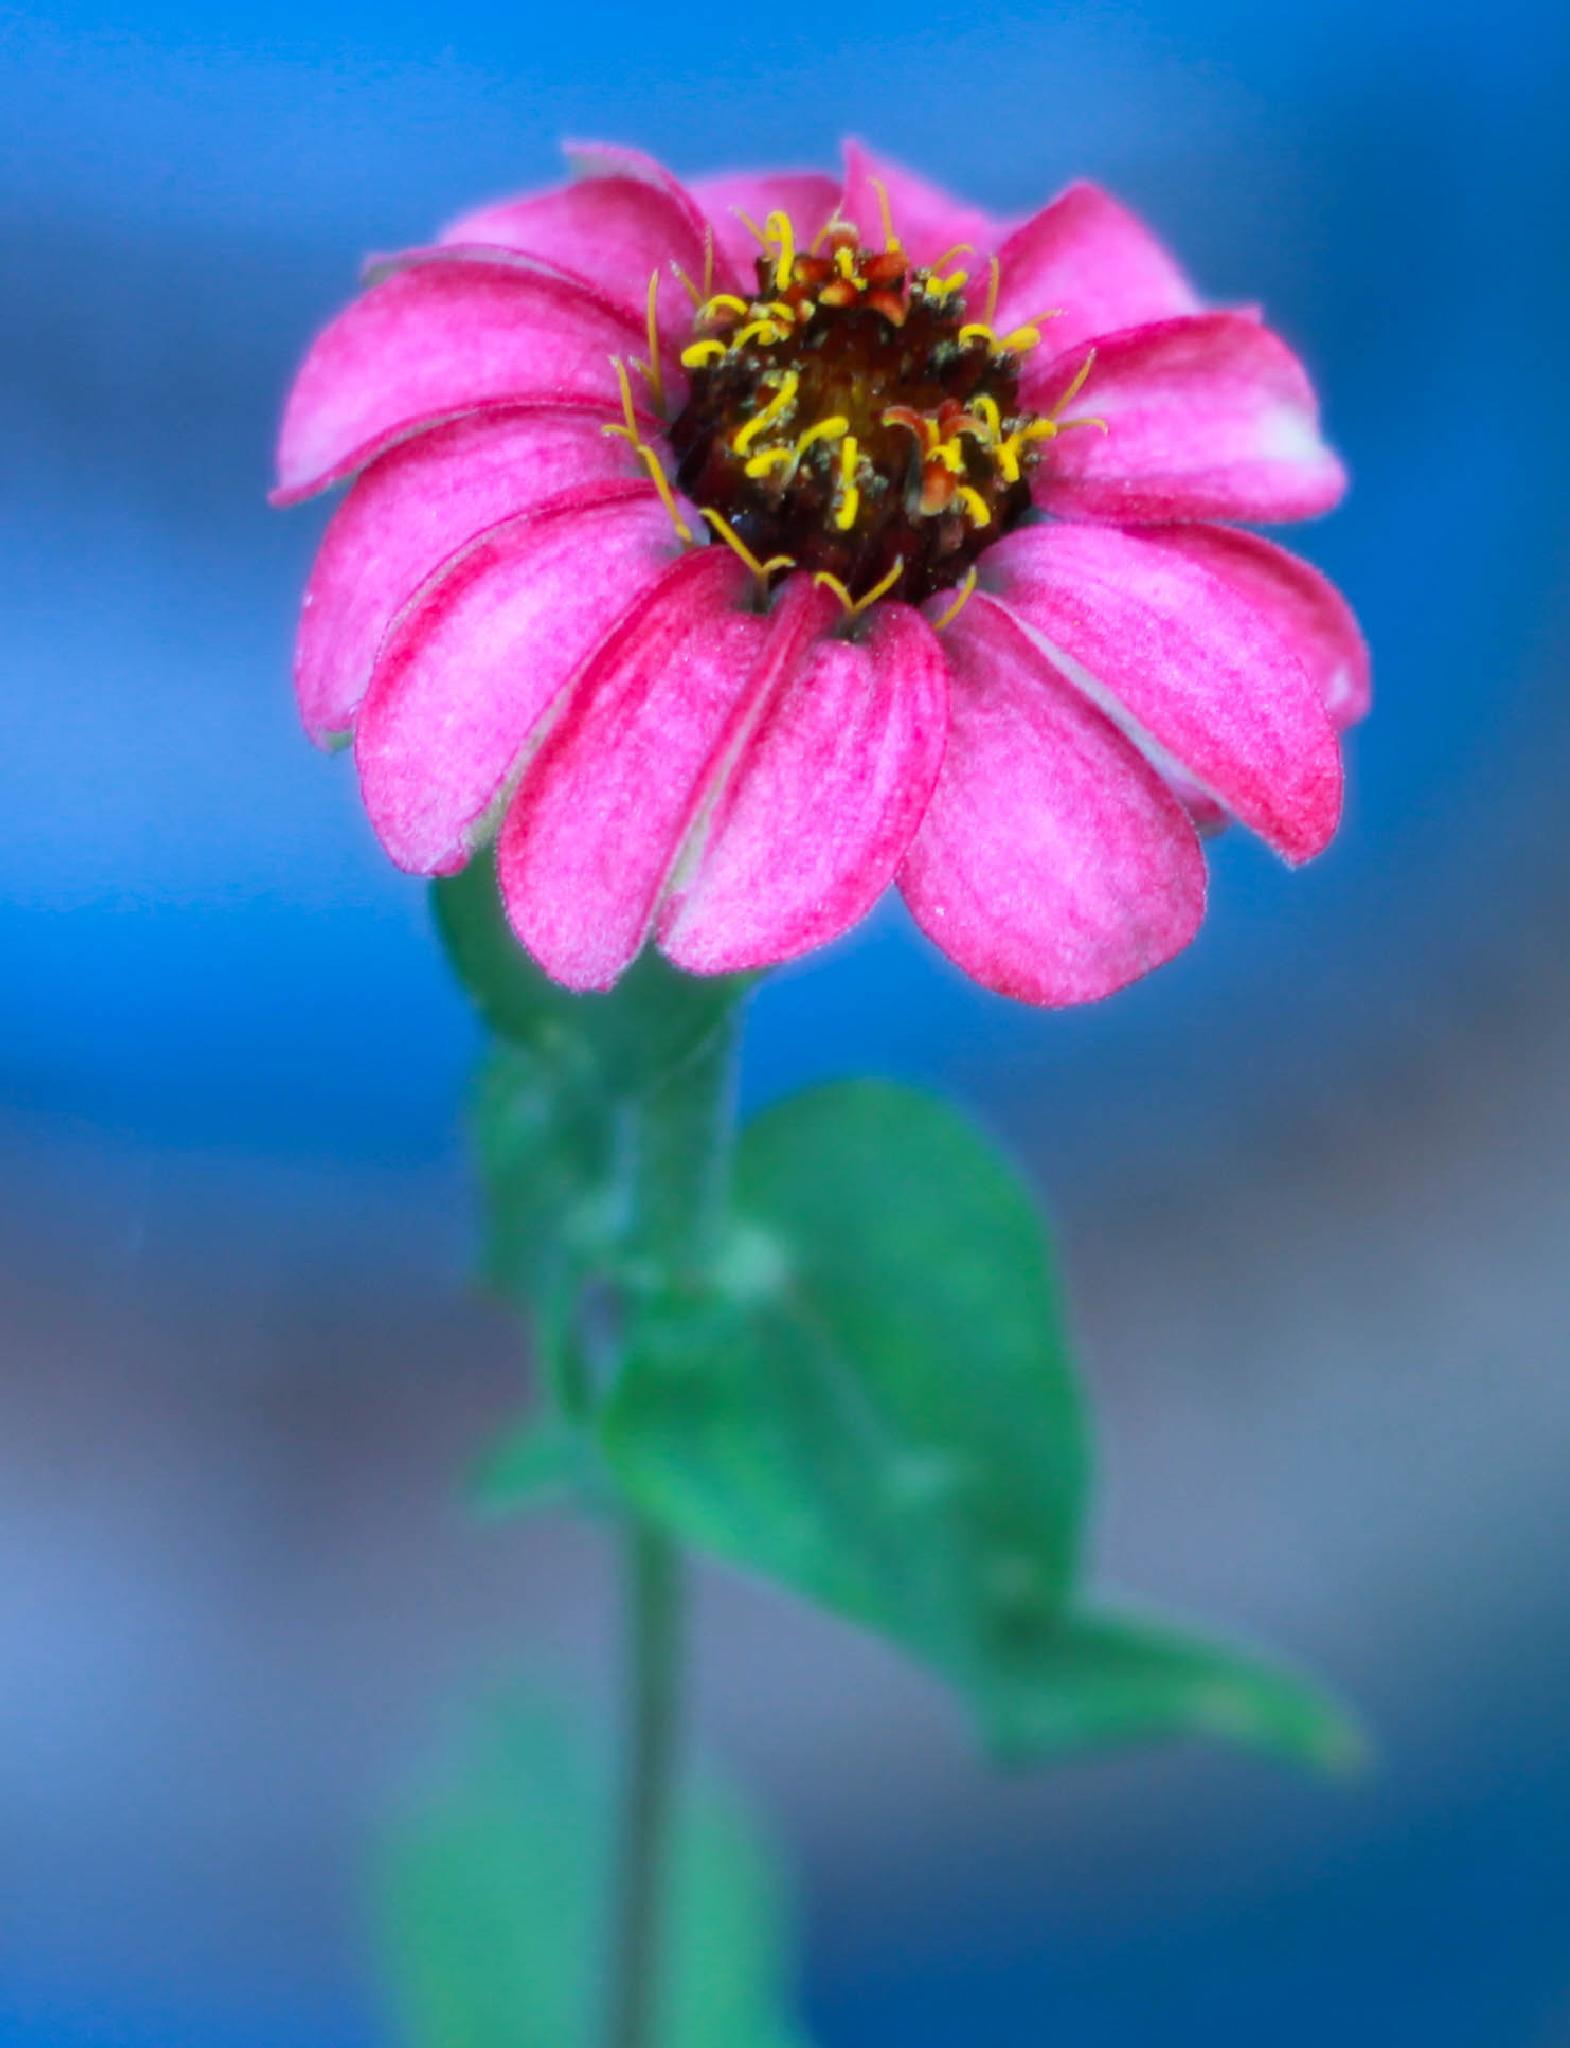 Last Pink Flower by shirleymariefranklin